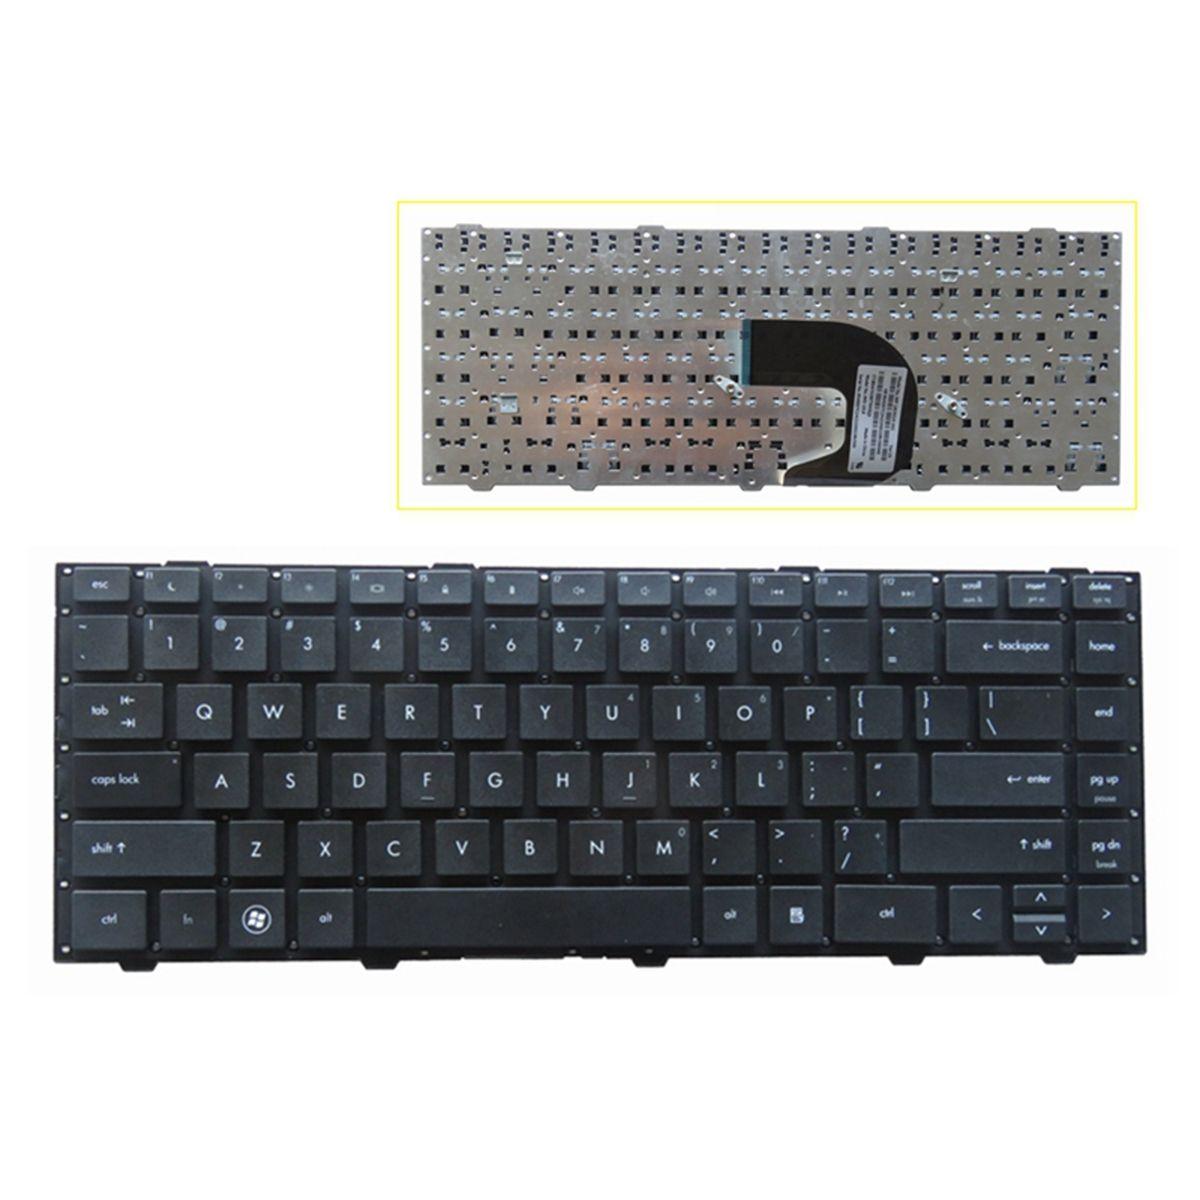 HP 프로 북 4446s 4440s 4441s 4445s 시리즈 키보드 블랙 US 없음 프레임 미국 레이아웃 수리 키보드에 노트북 Keyobard 교체